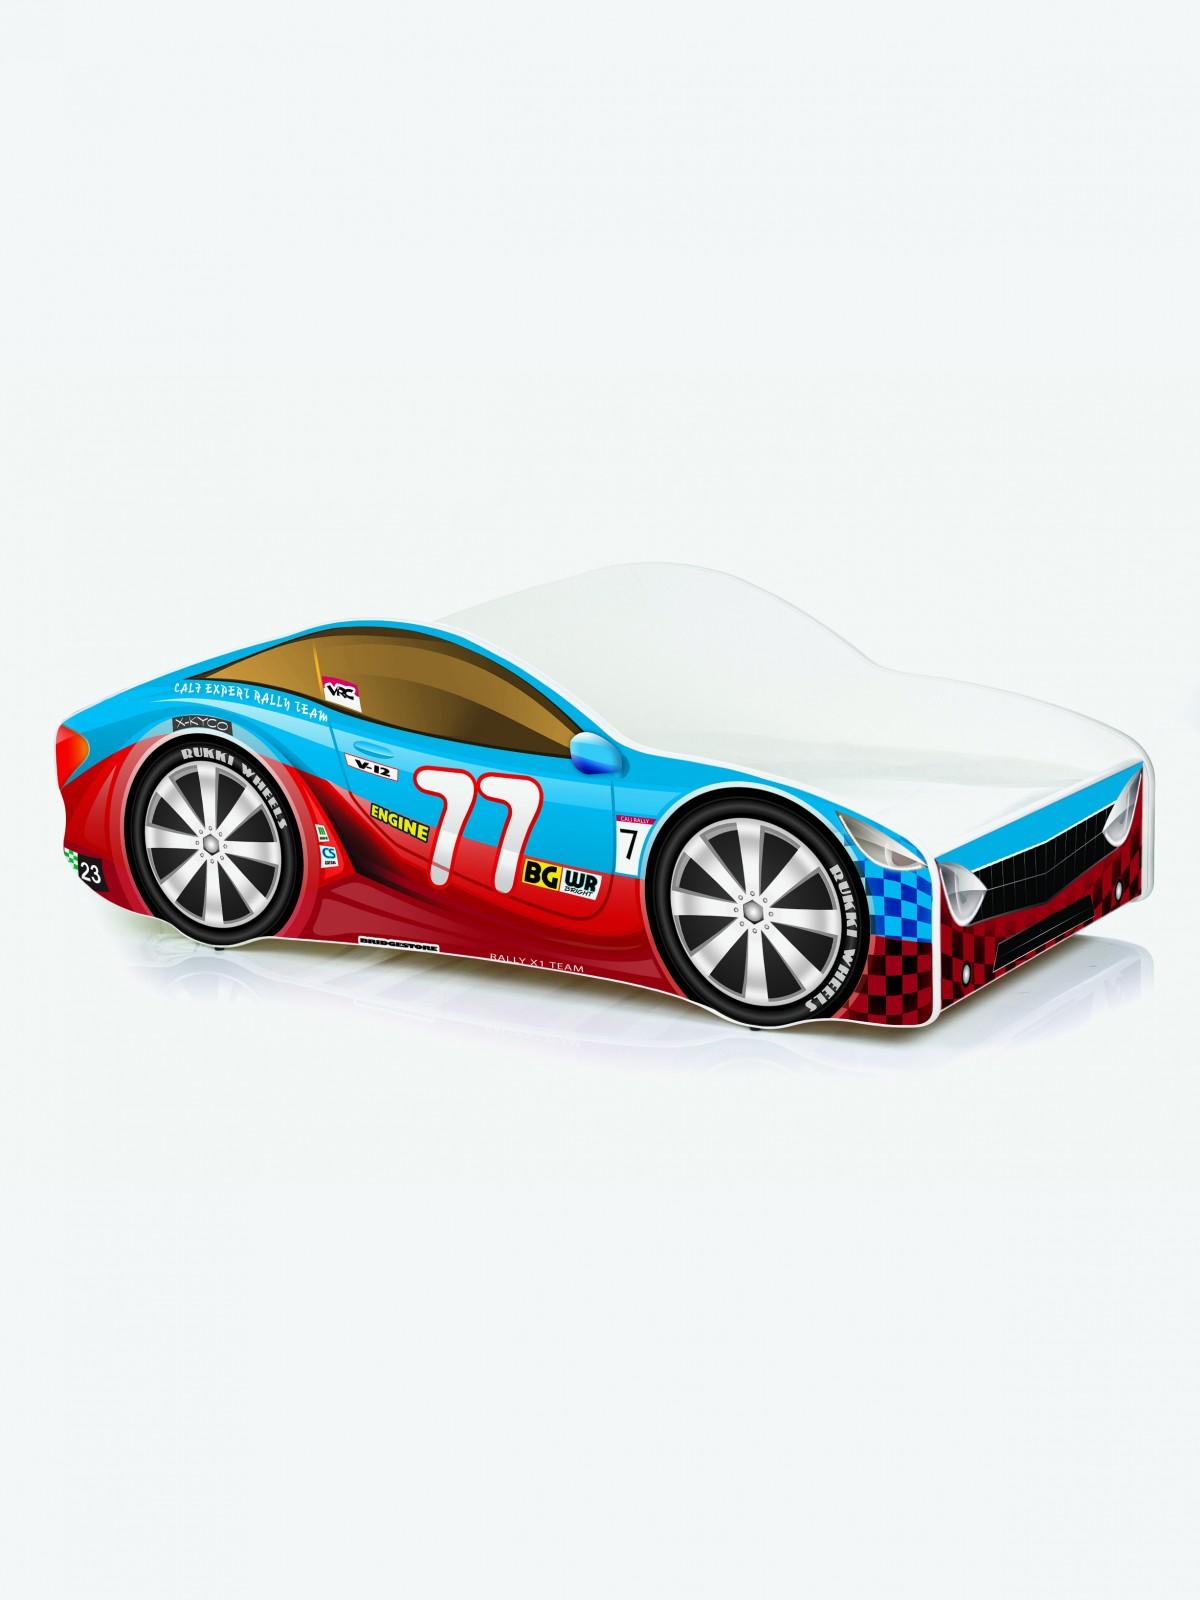 auto kinderbett nobiko mit matratze und lattenrost rot blau 7 140x70cm. Black Bedroom Furniture Sets. Home Design Ideas